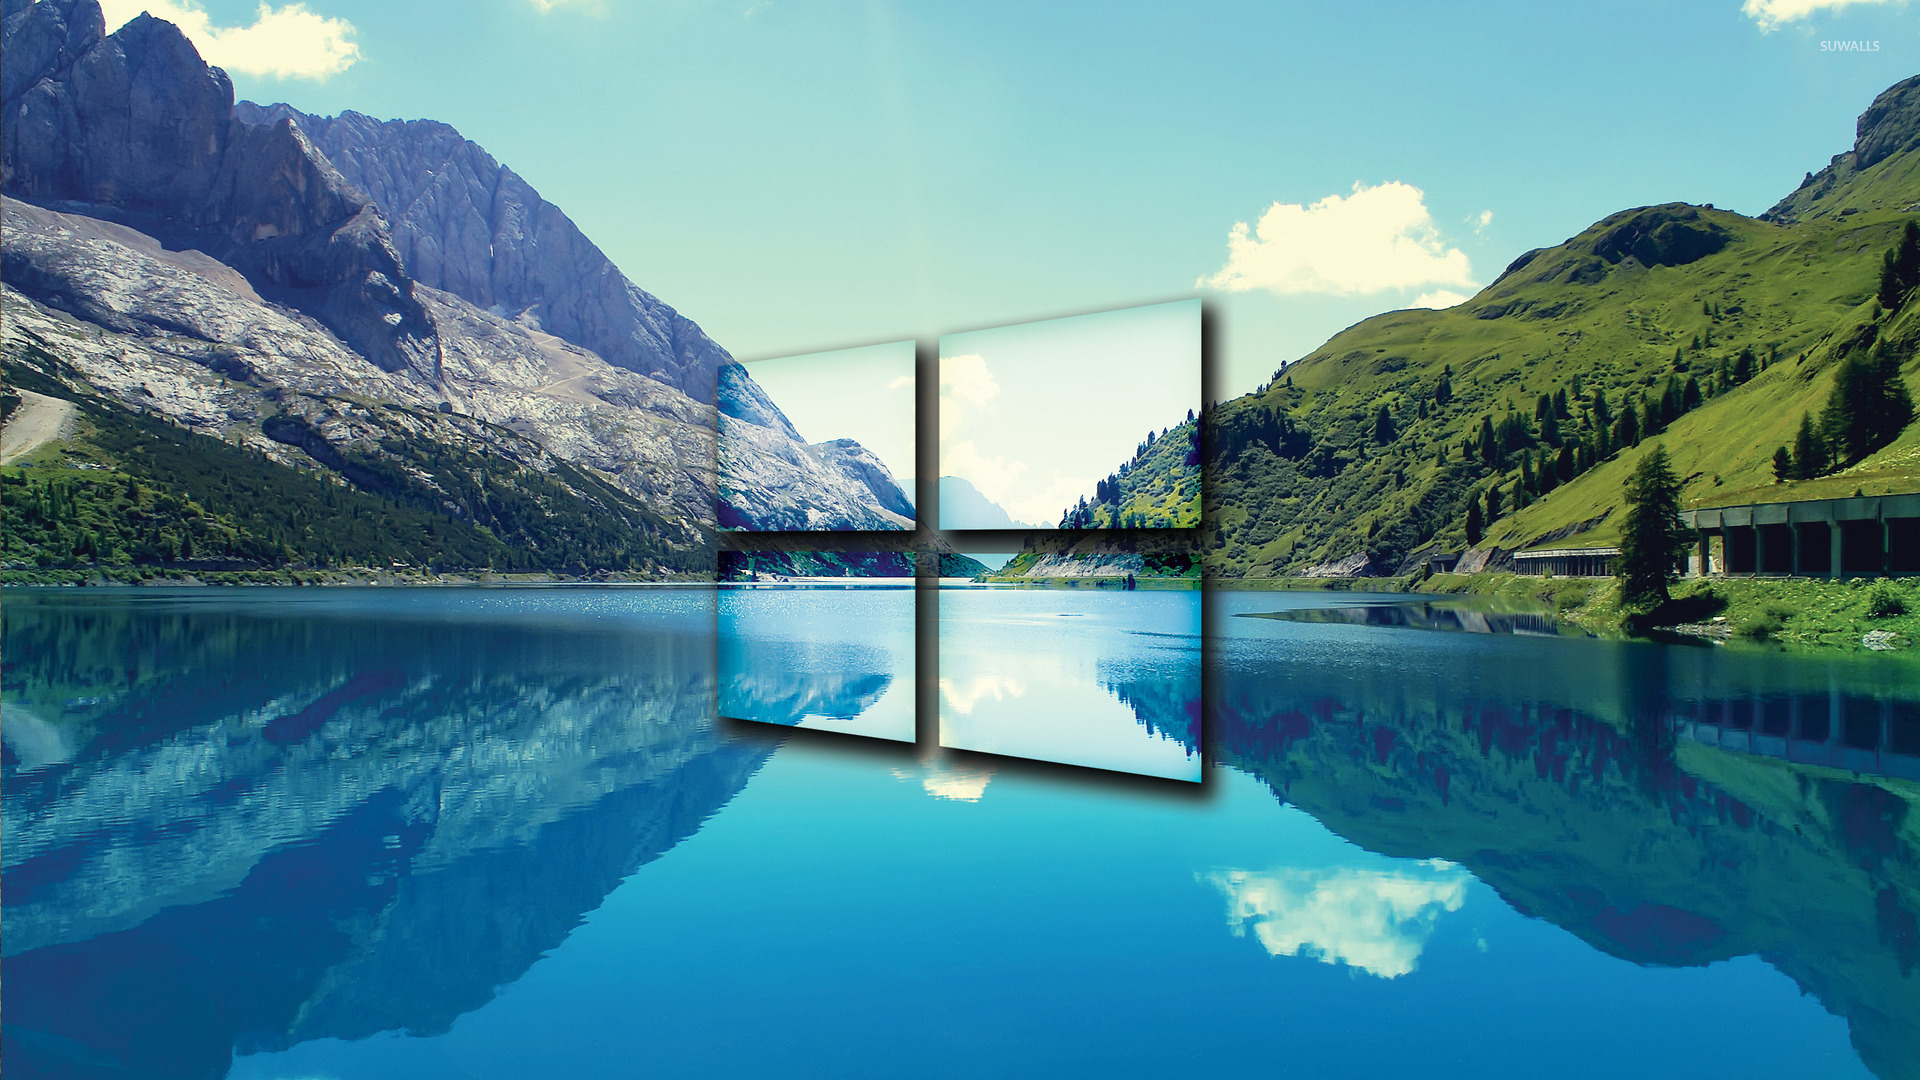 Windows 10 [3] wallpaper - Computer wallpapers - #46287